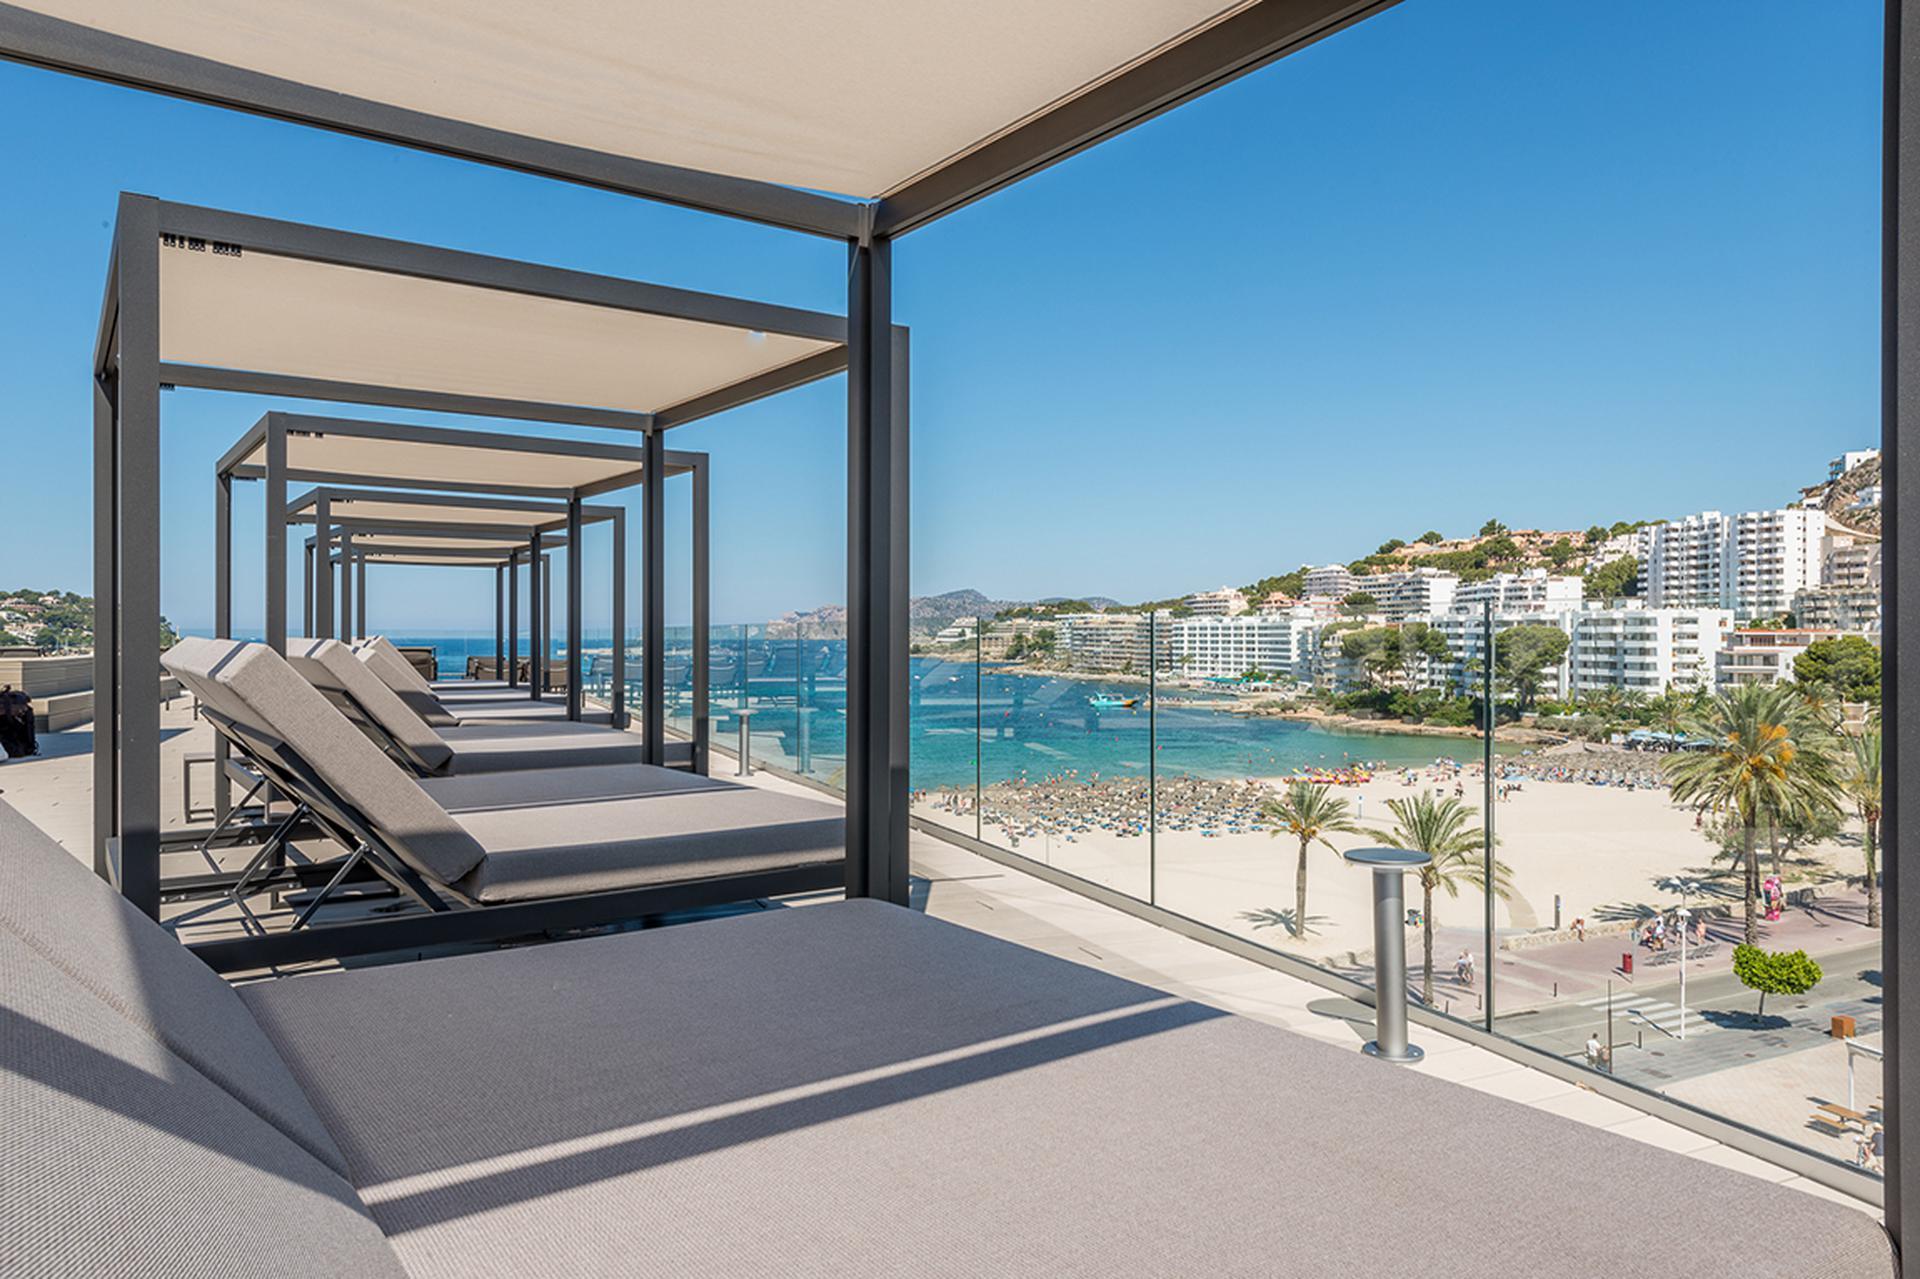 hotel h10 casa del mar mallorca spanien sunweb. Black Bedroom Furniture Sets. Home Design Ideas